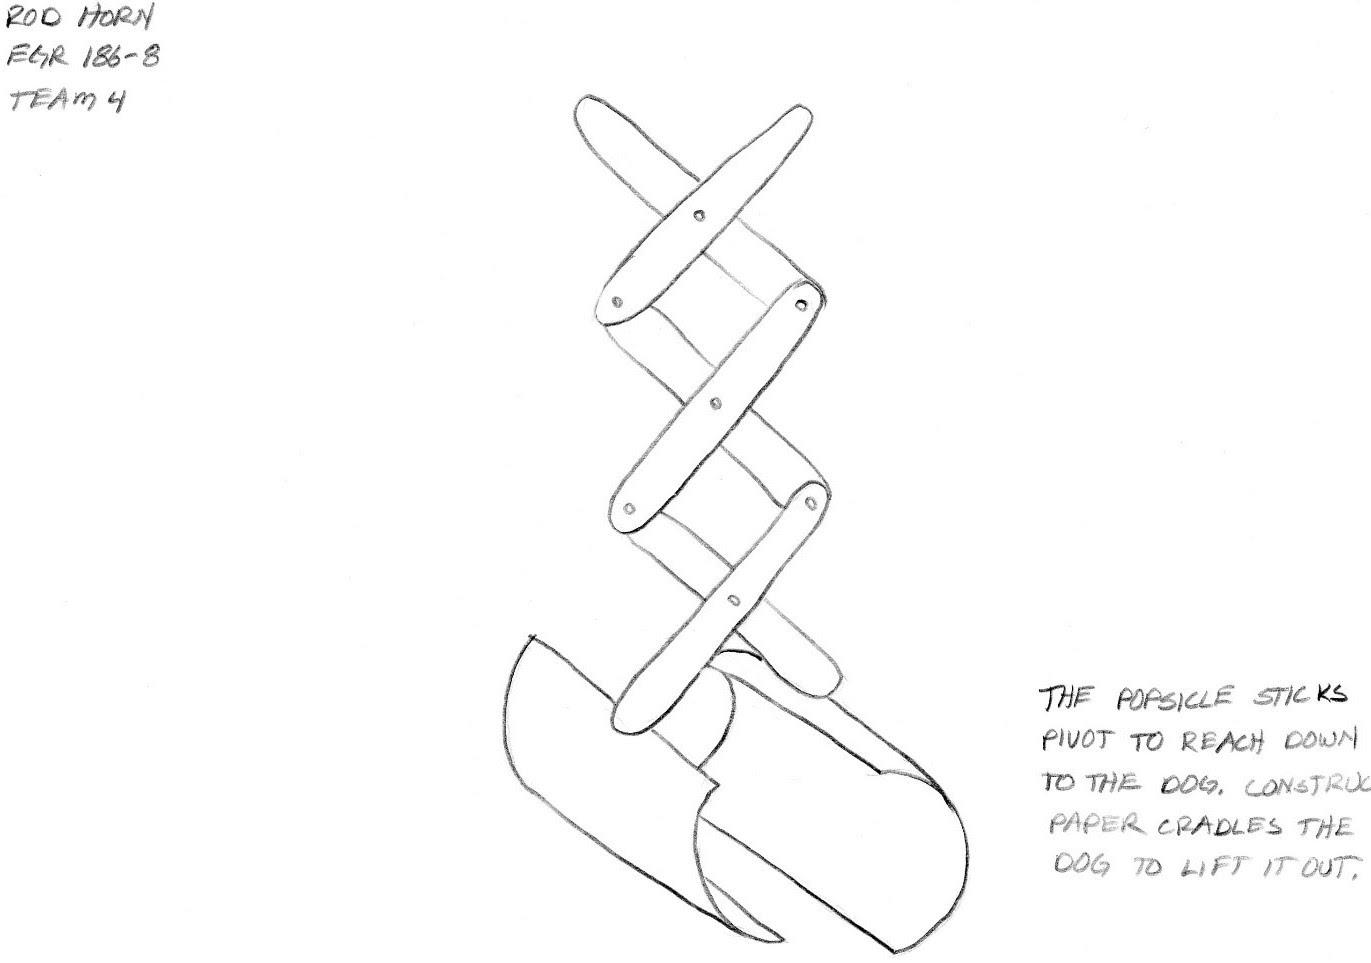 1989 Ford 555b Backhoe Wiring Diagram